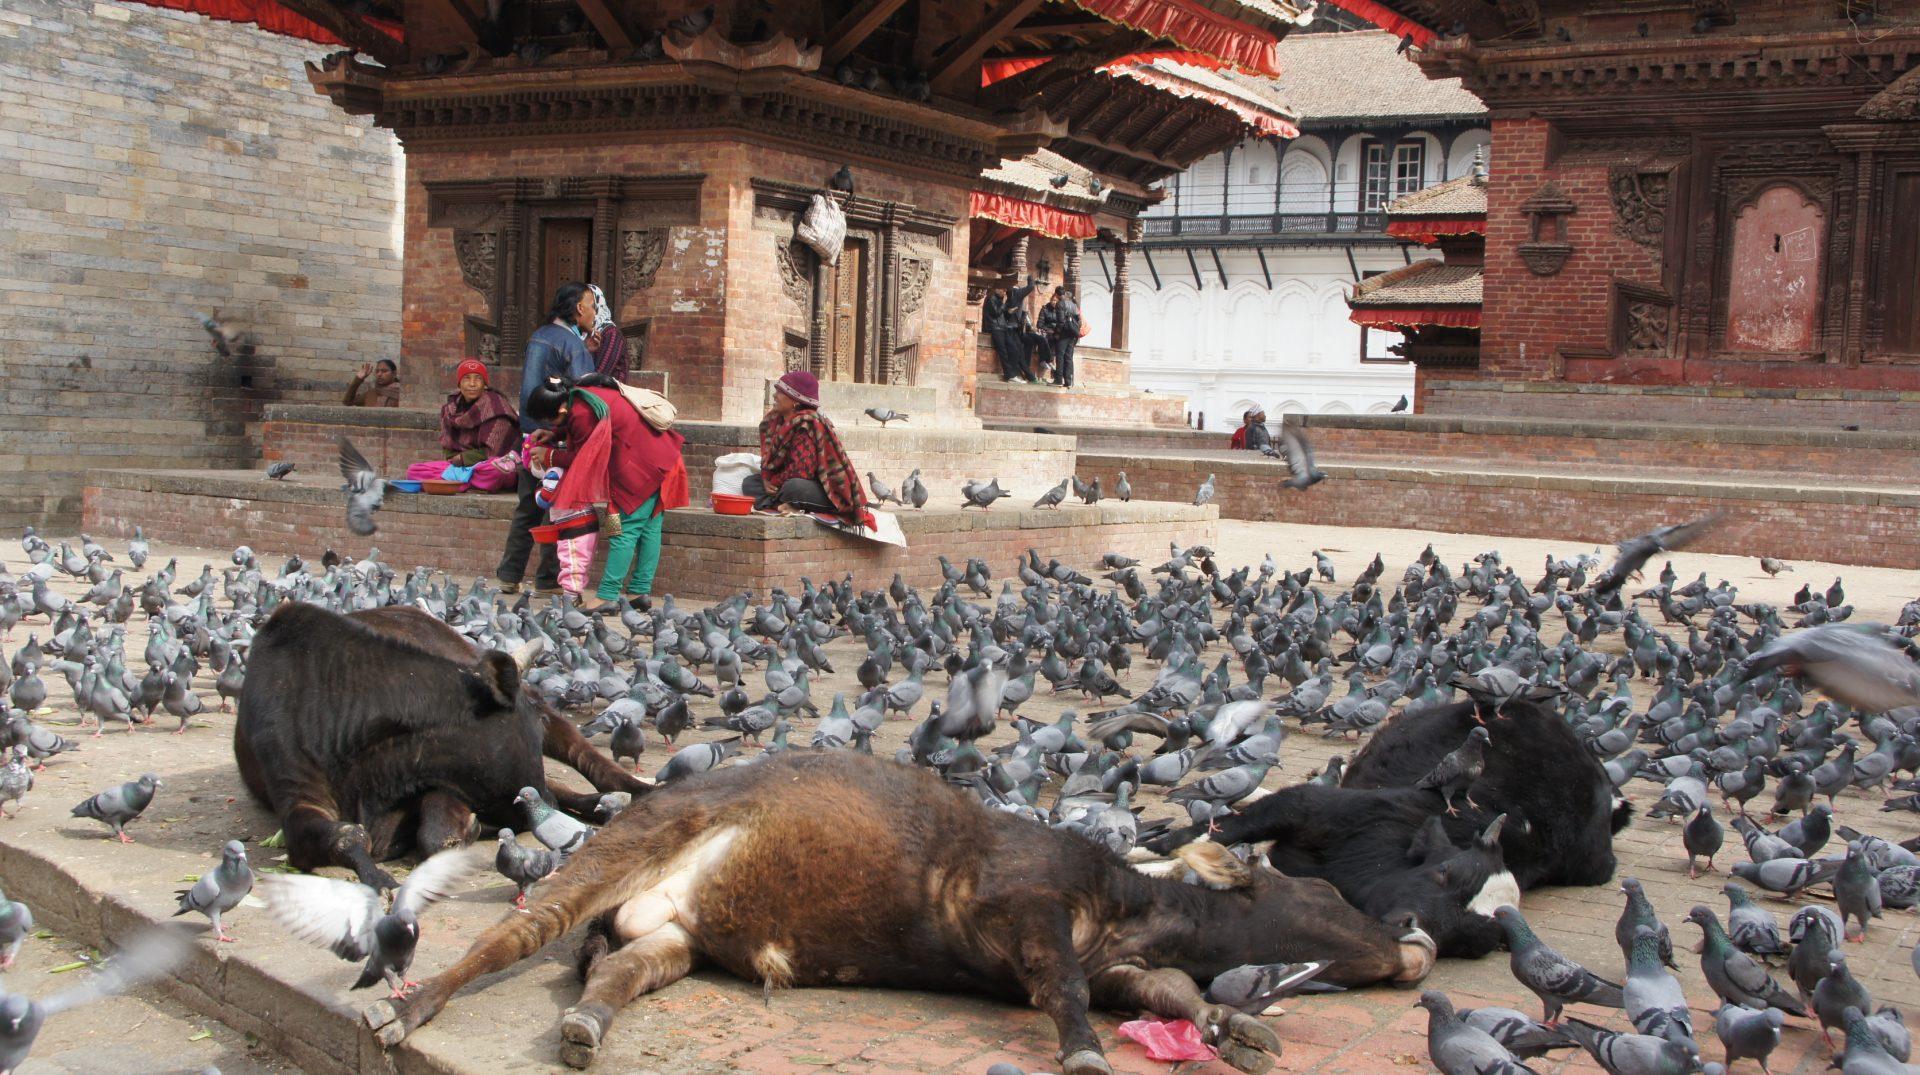 Vaches au repos Kathmandou Népal